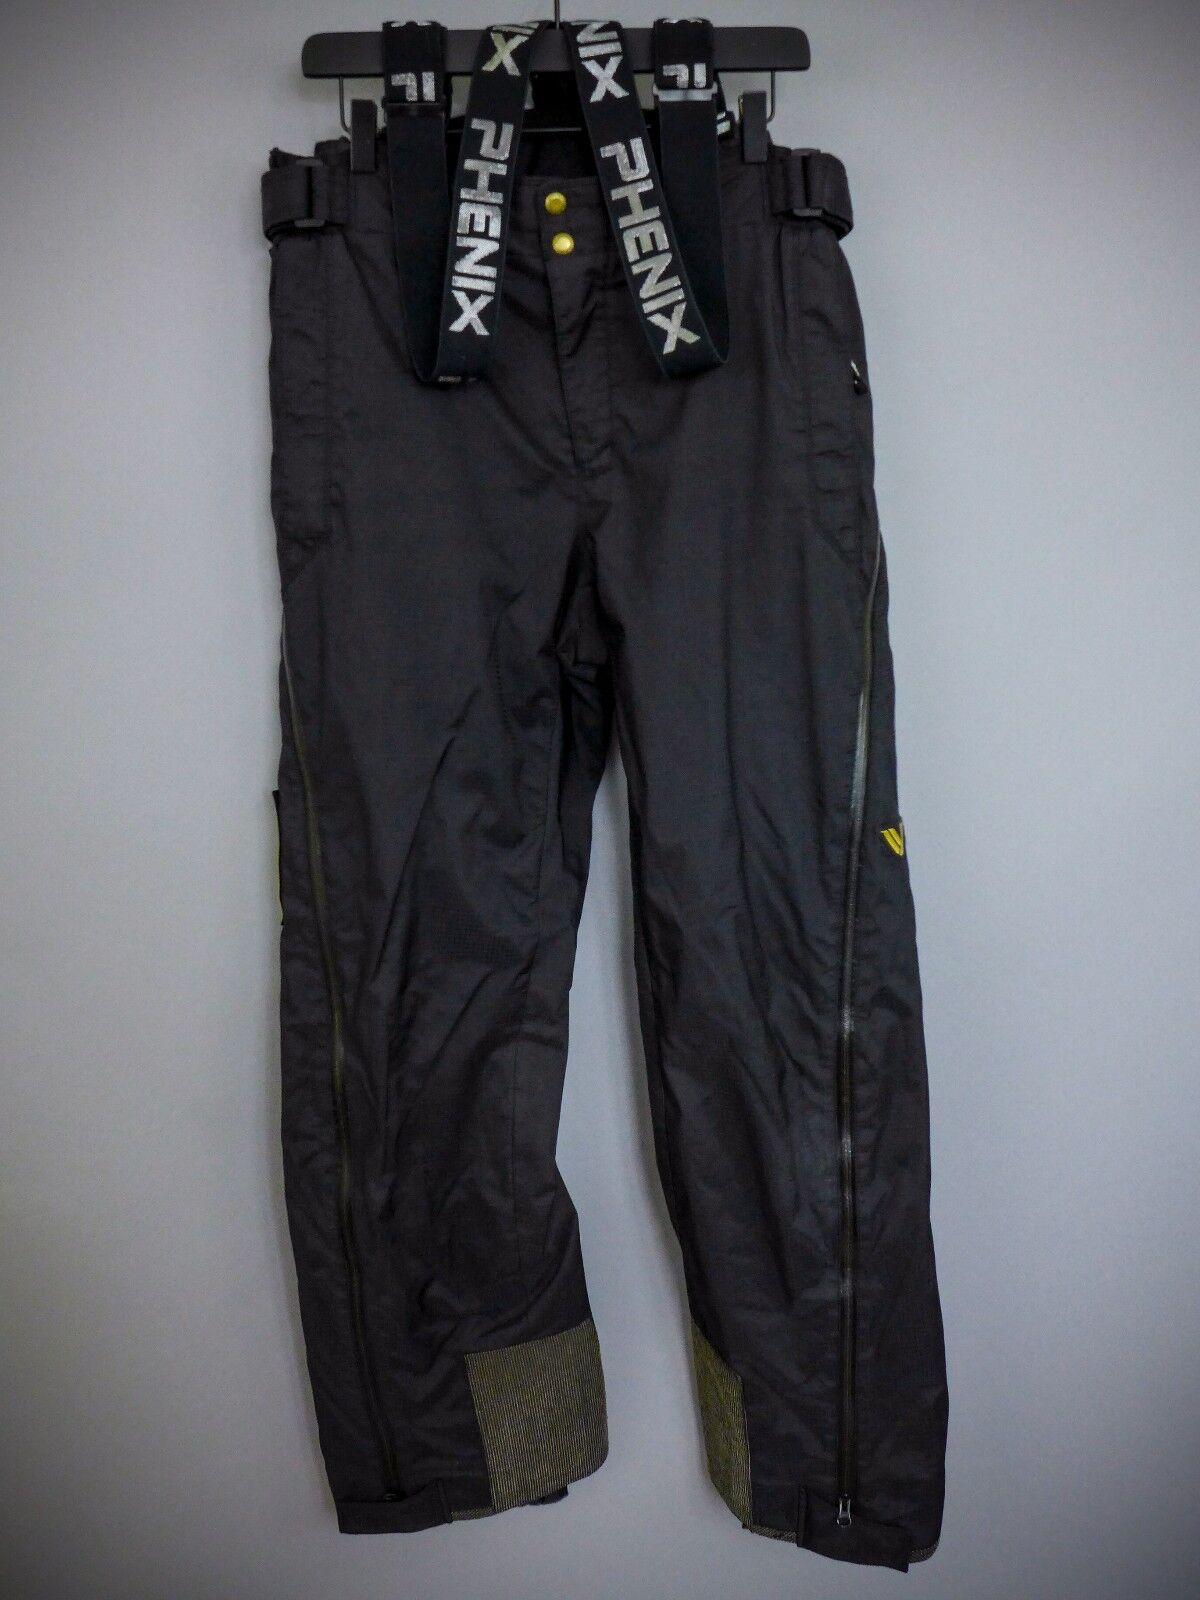 XII362 Men Phenix Diaplex Skiing Snowboarding Salopettes 52 W36  L33  simple and generous design